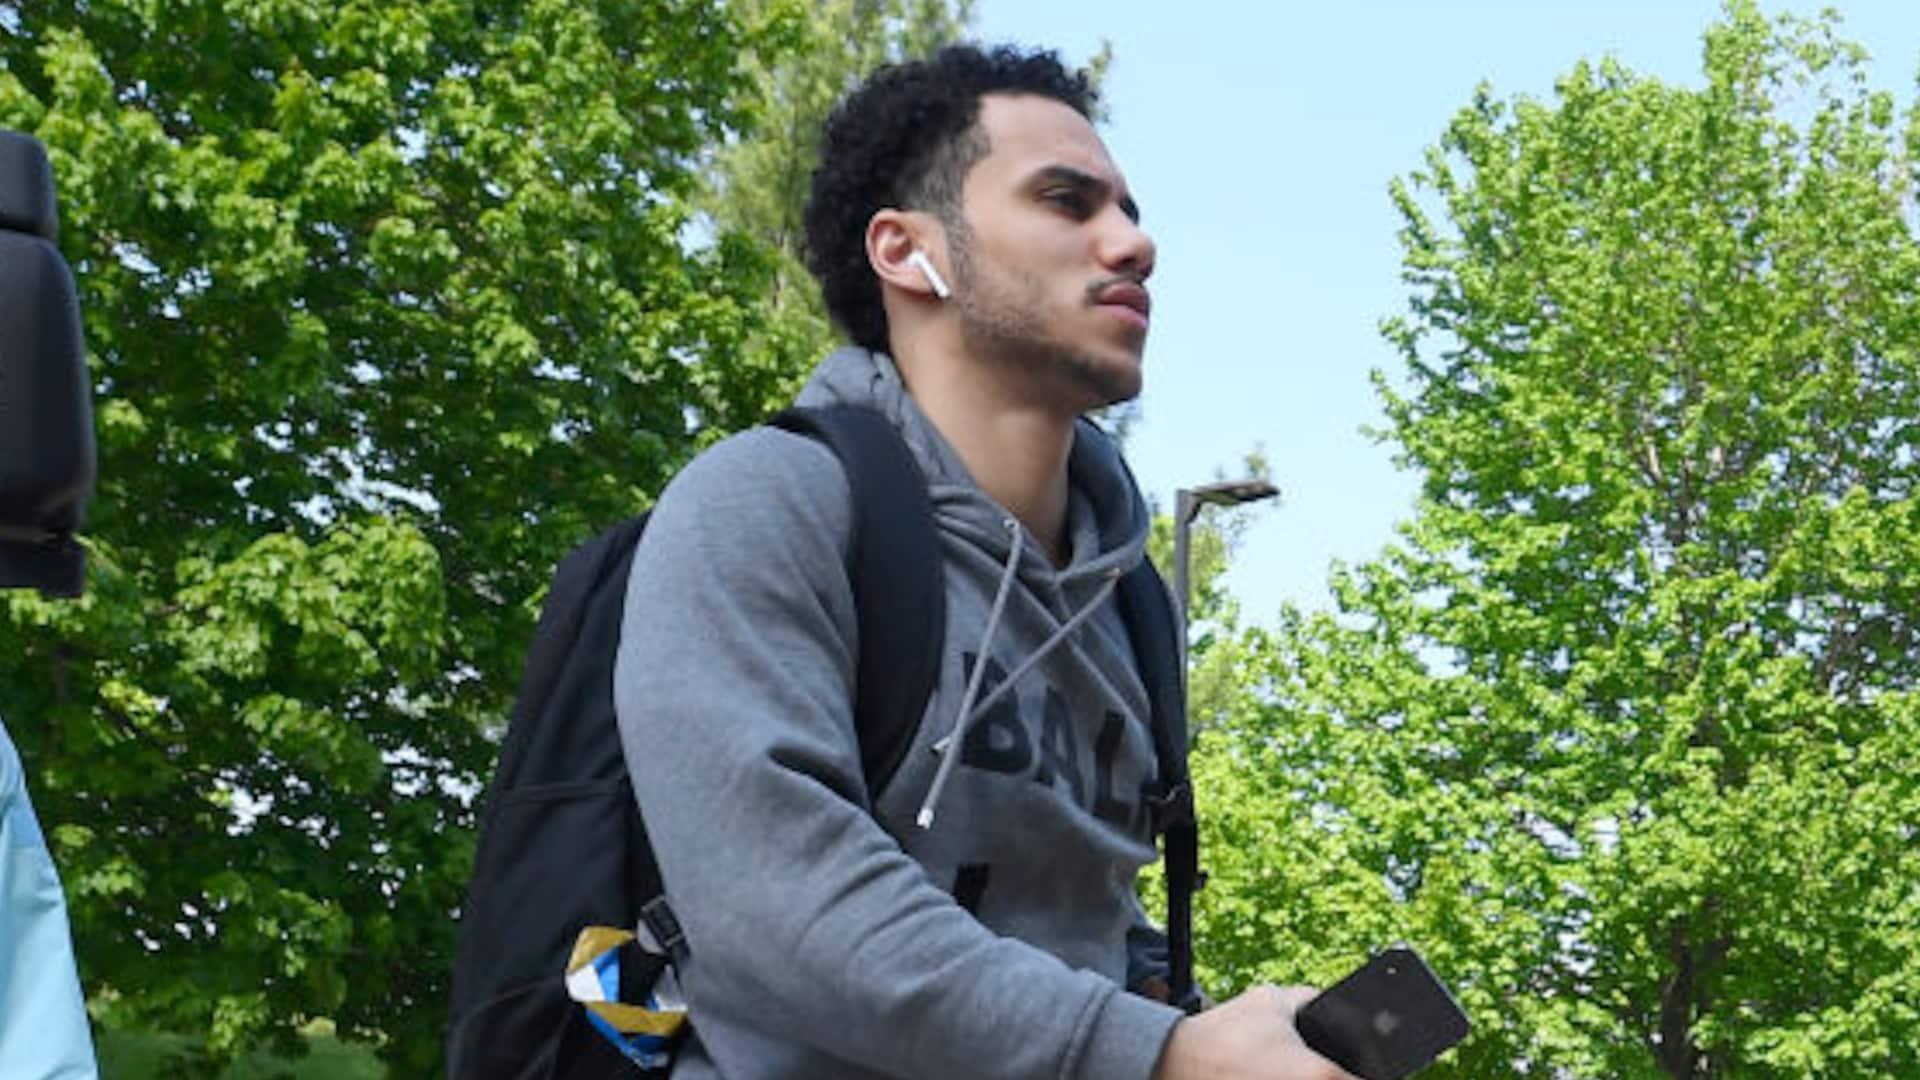 Basketball's EuroLeague cancels season because of virus